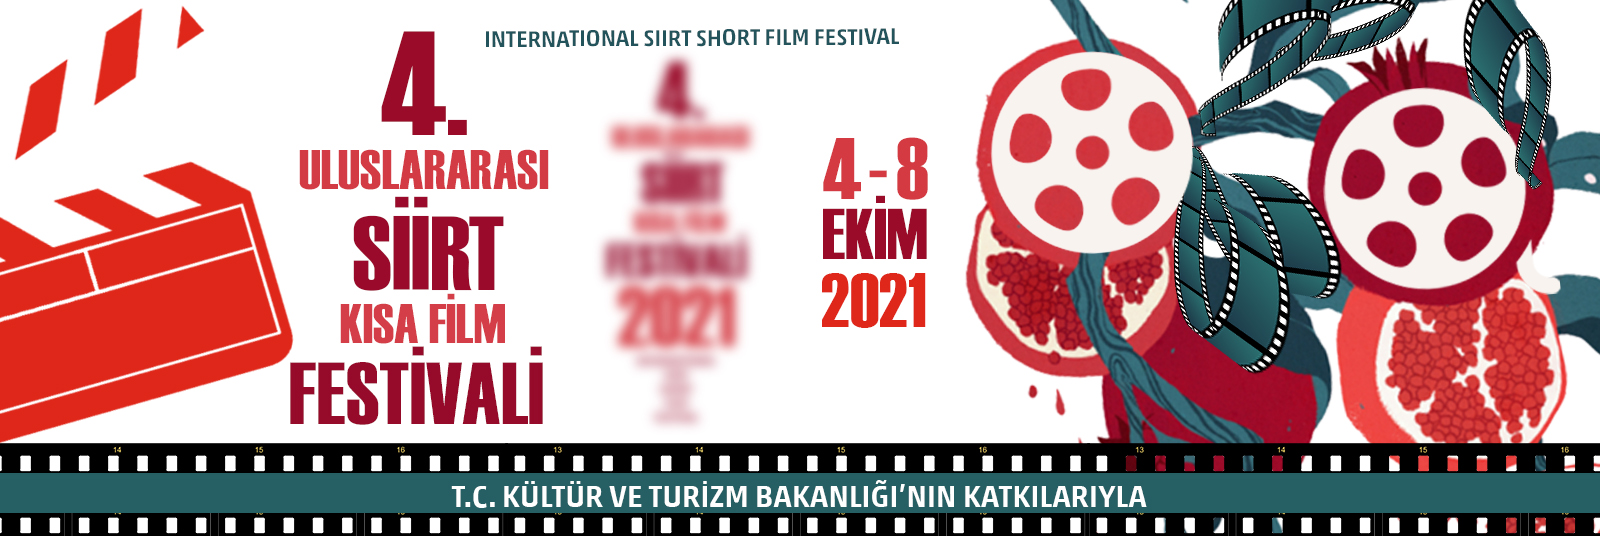 4. Uluslararası Siirt Kısa Film Festivali